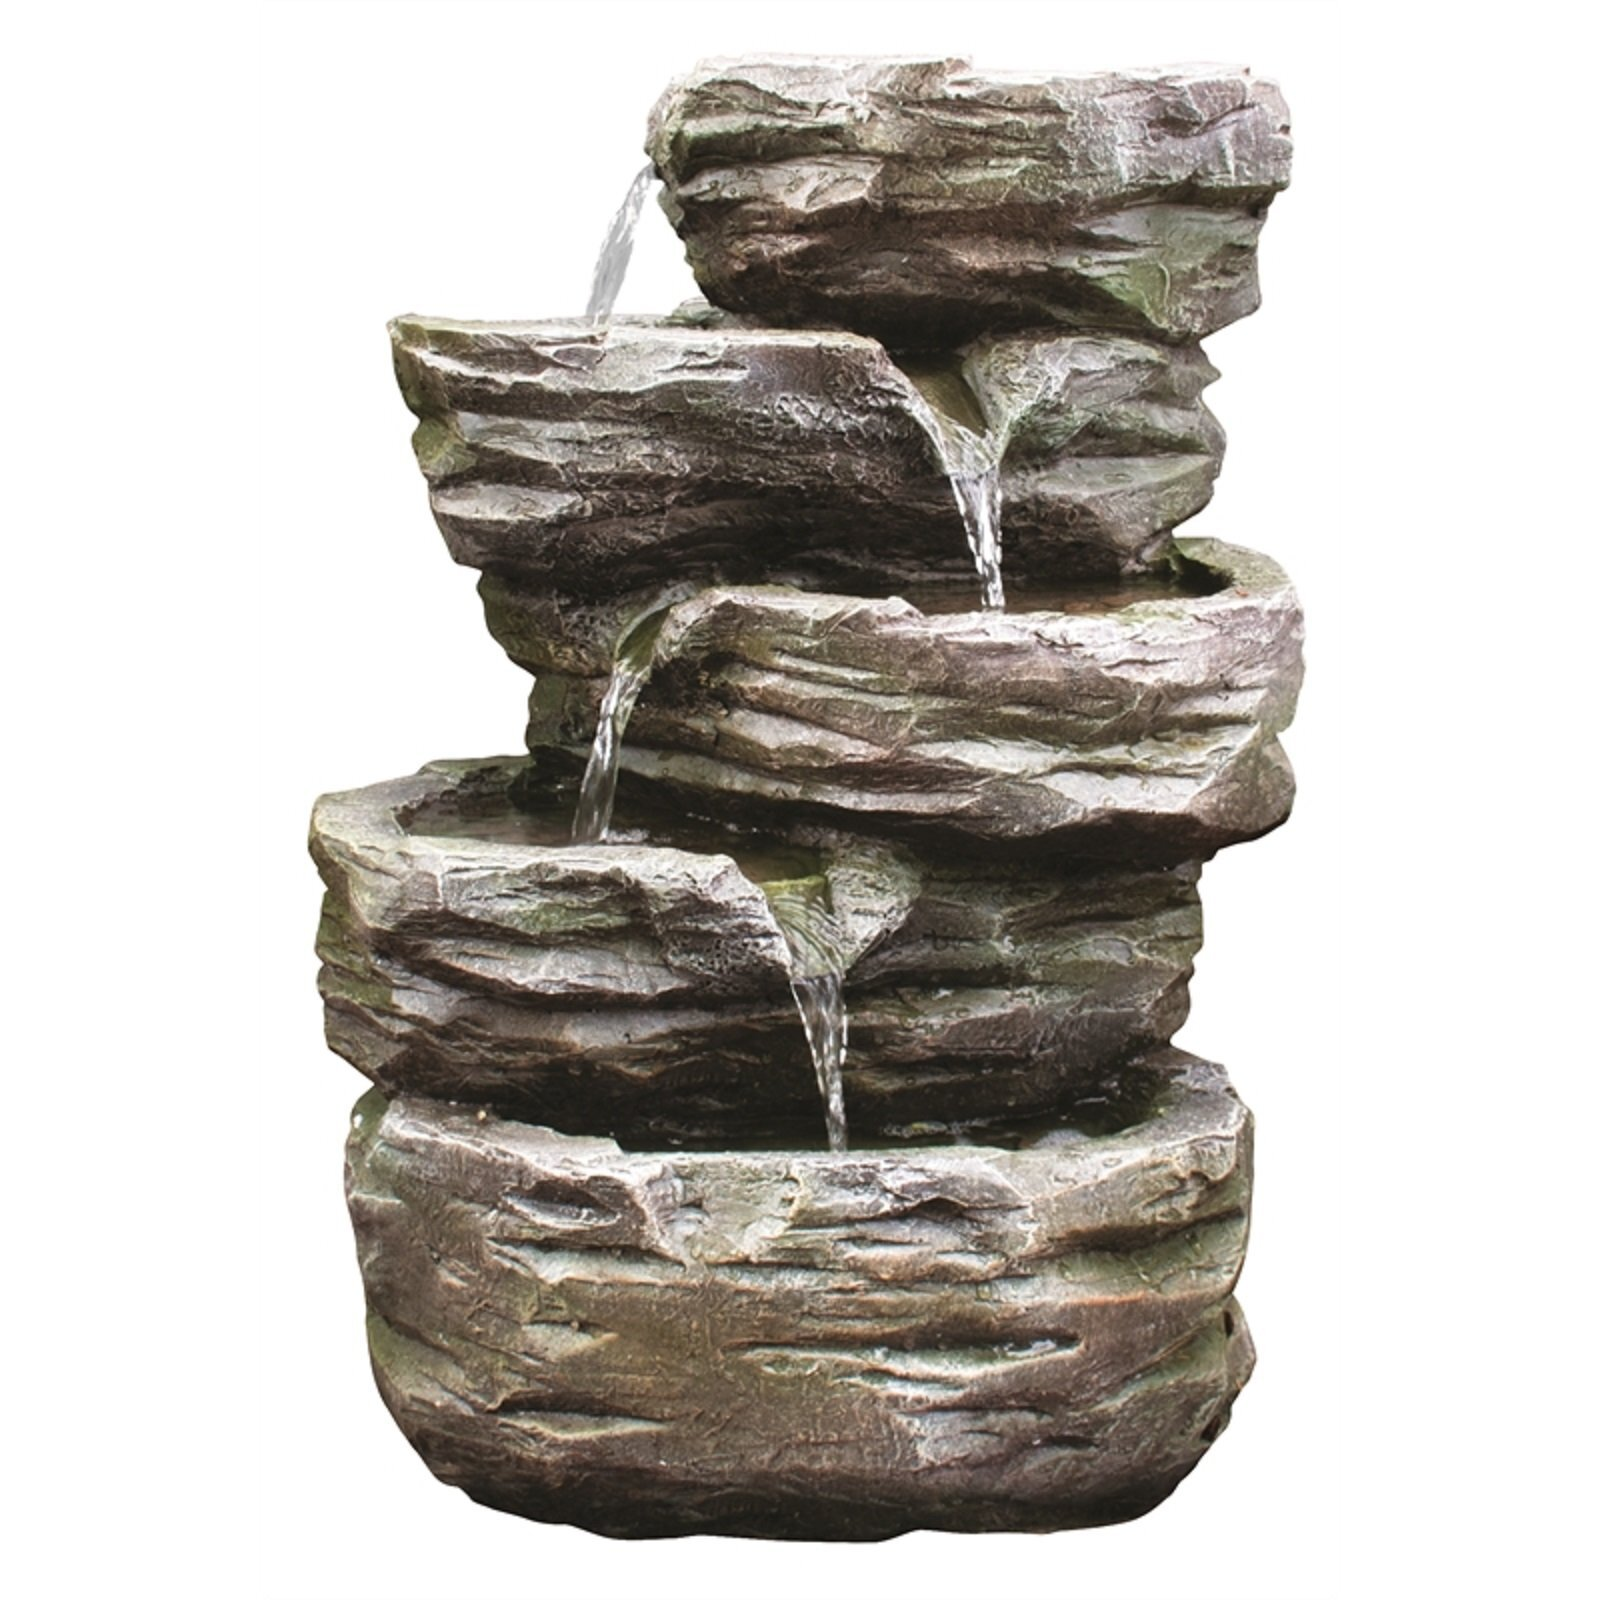 Northcote Pottery 35 x 35 x 34cm Magna Fountain